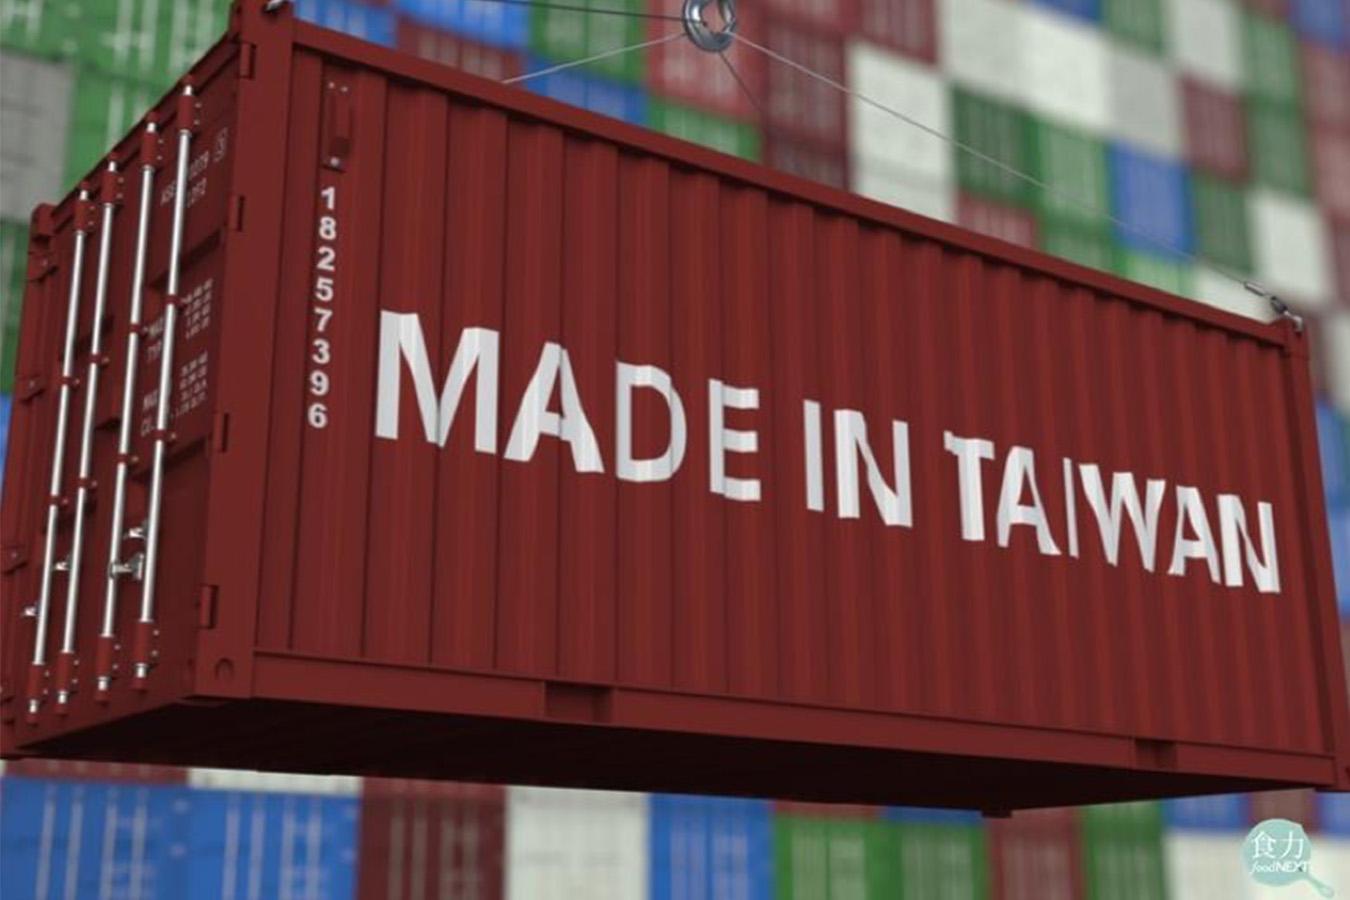 【TGA x 食力】台灣外銷食品「接軌國際」將遇什麼問題?